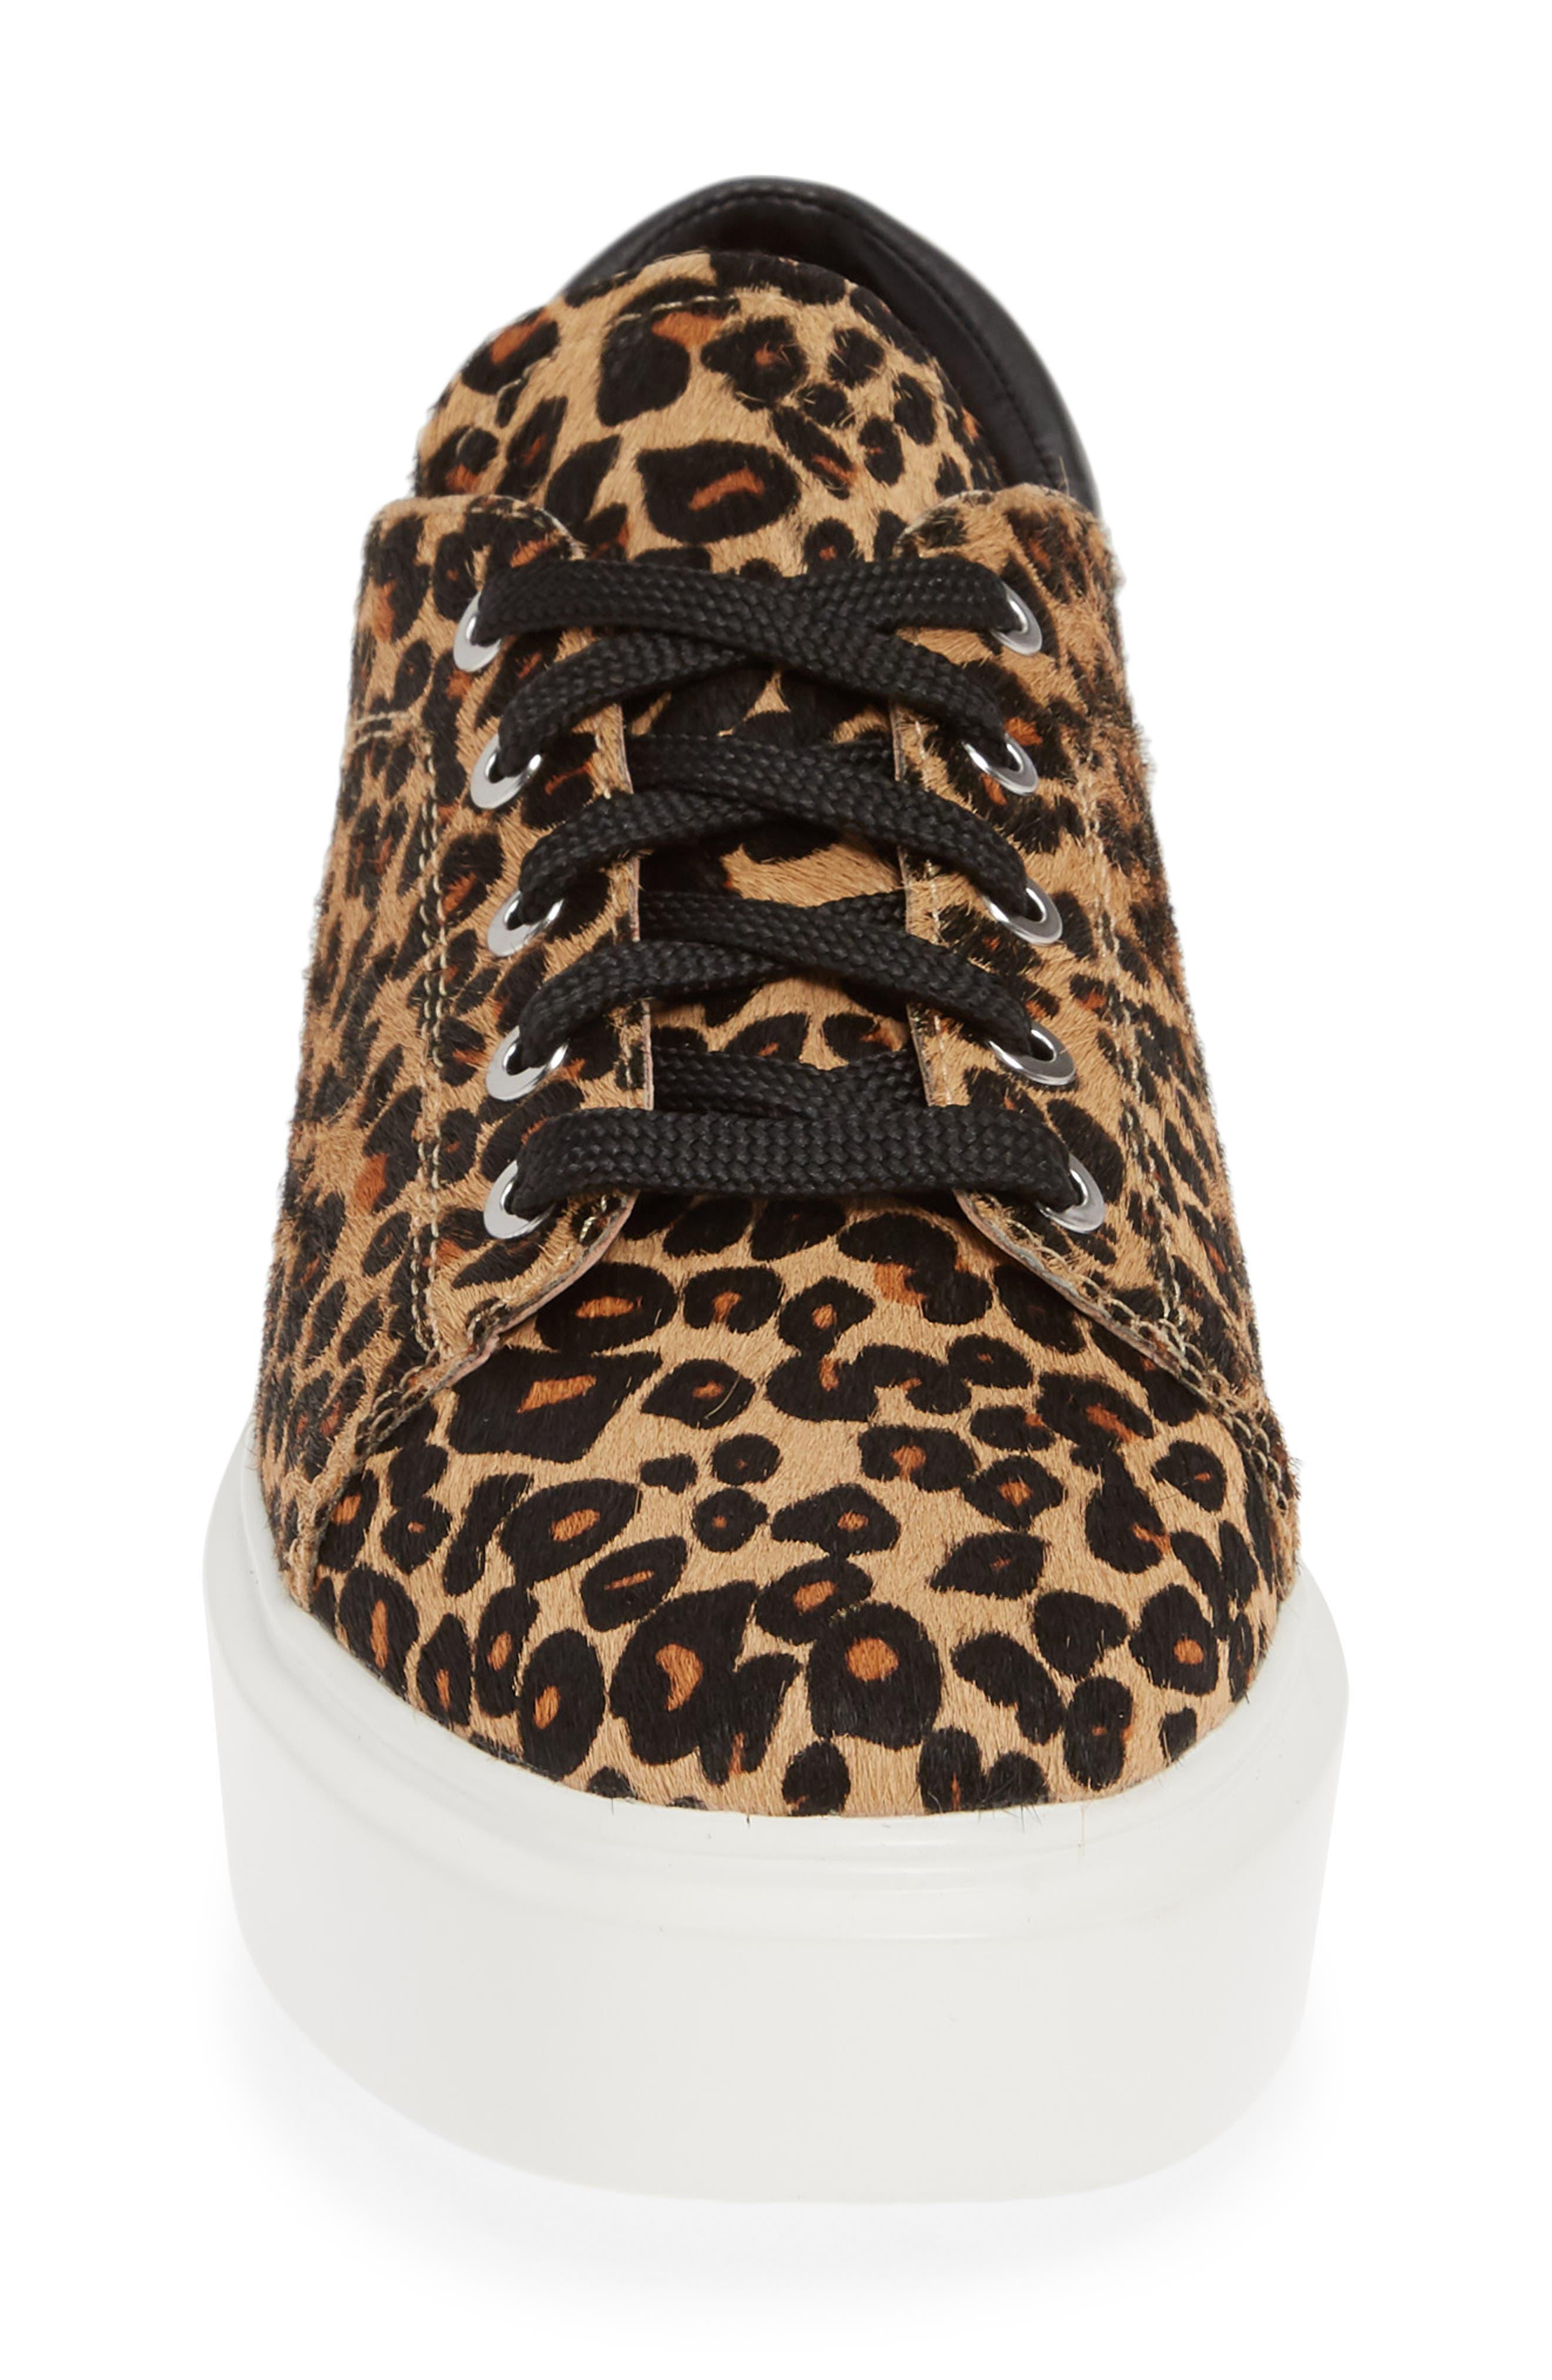 LINEA PAOLO, Kendra Genuine Calf Hair Platform Sneaker, Alternate thumbnail 4, color, LEOPARD PRINT CALF HAIR